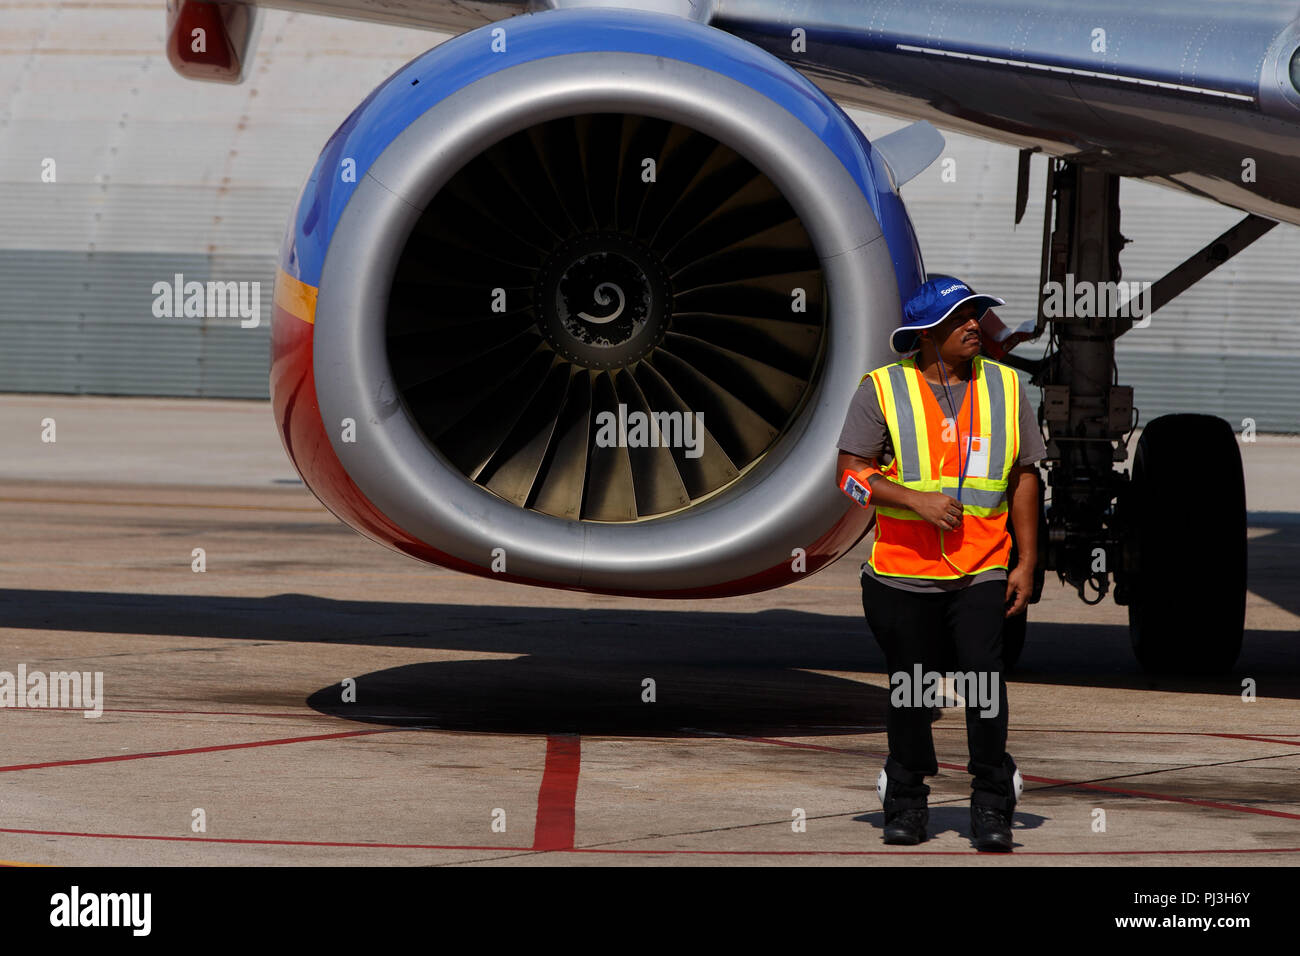 Turbofan Stock Photos & Turbofan Stock Images - Alamy